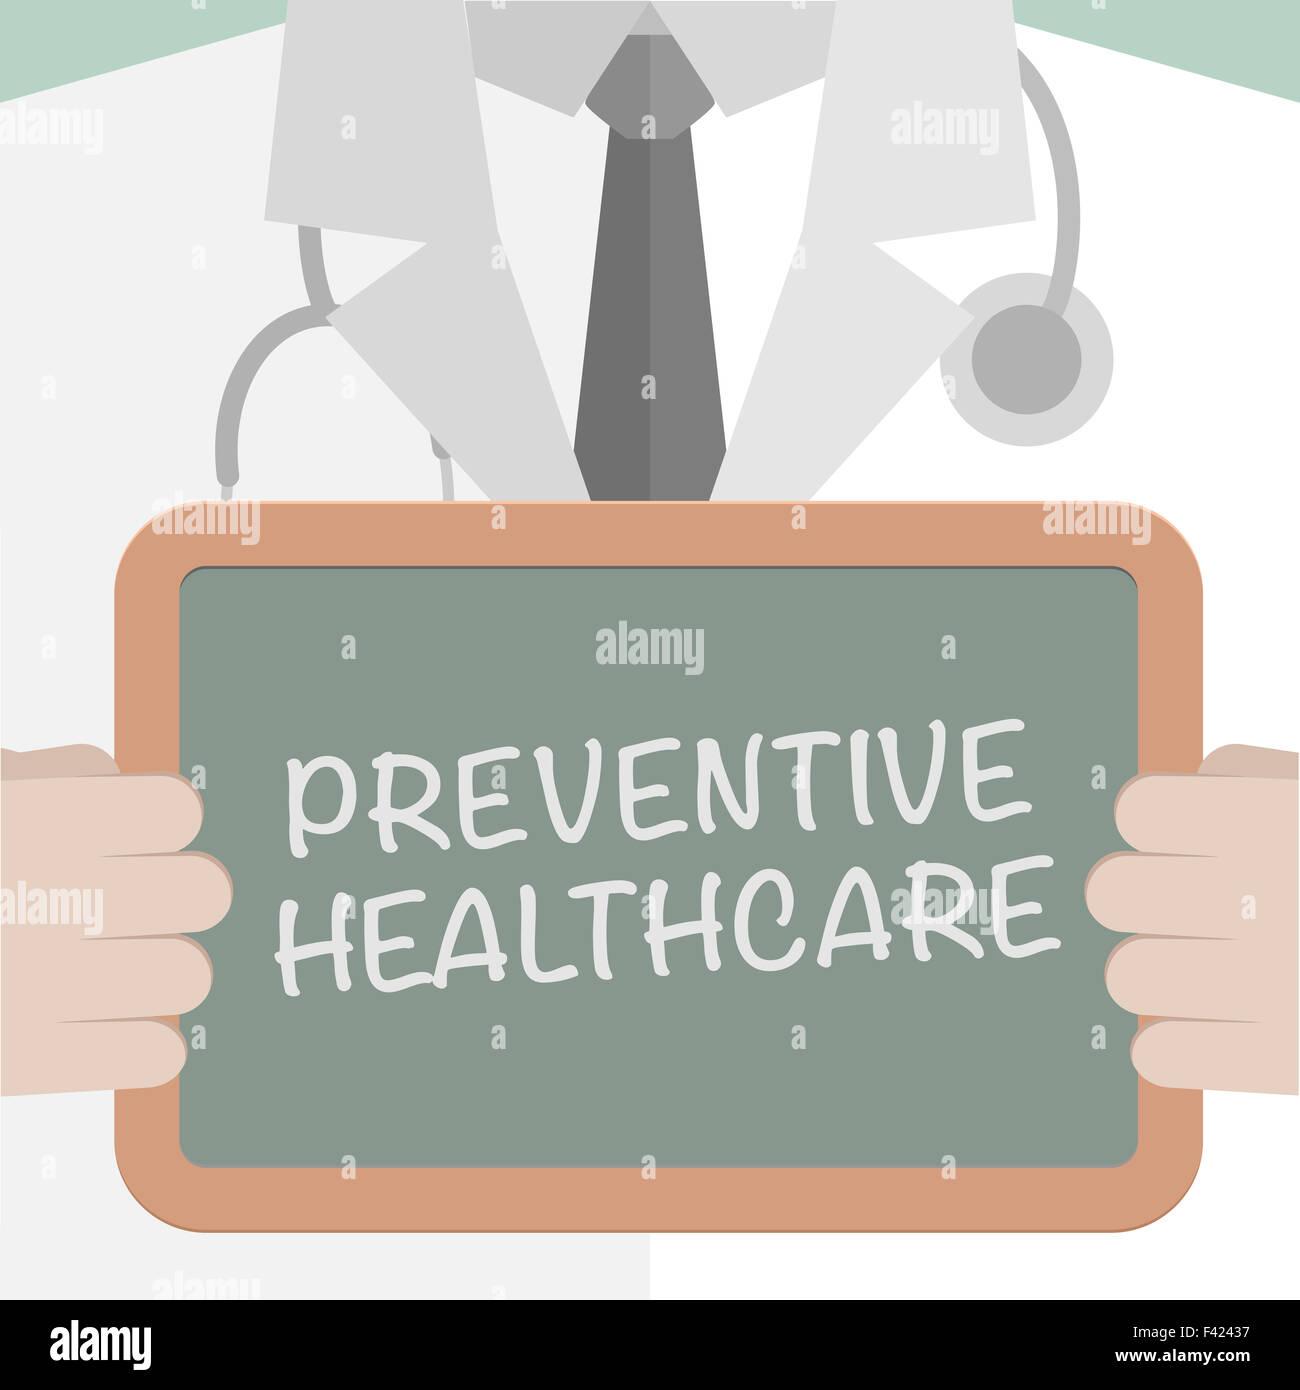 Medical Board Preventive Healthcare - Stock Image